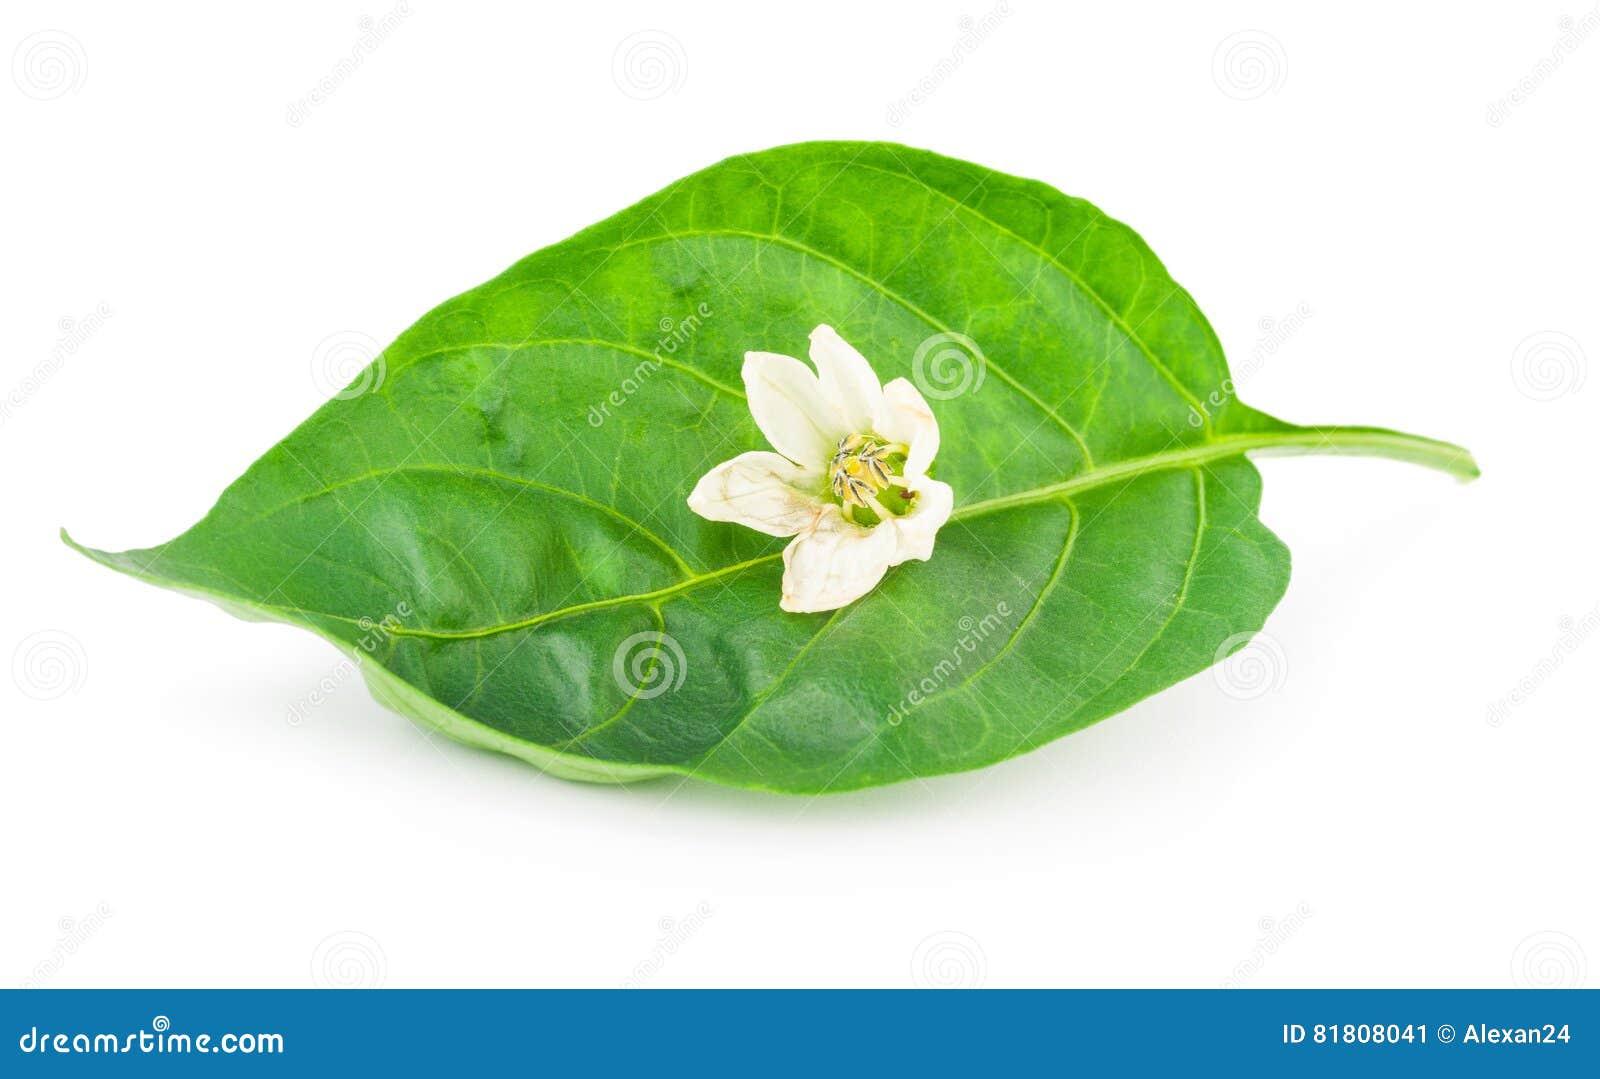 Лист перца с цветком